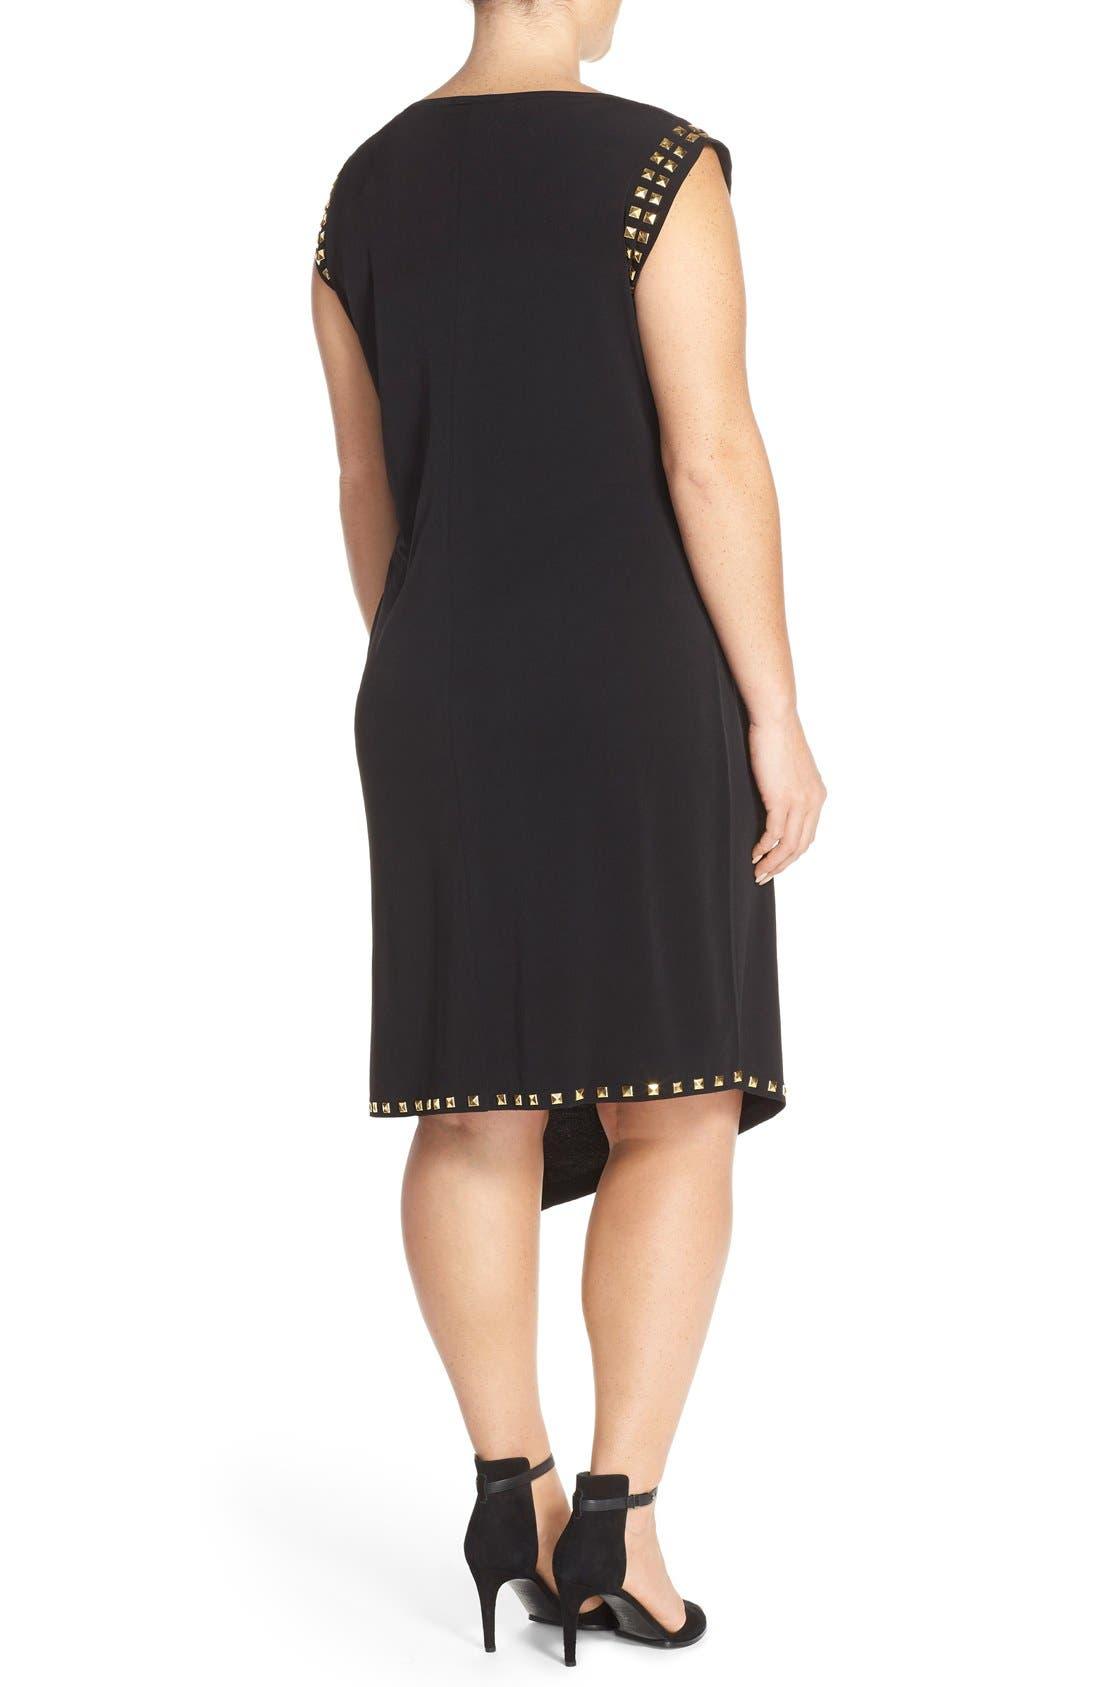 Studded Asymmetrical Shift Dress,                             Alternate thumbnail 2, color,                             Black/ Gold